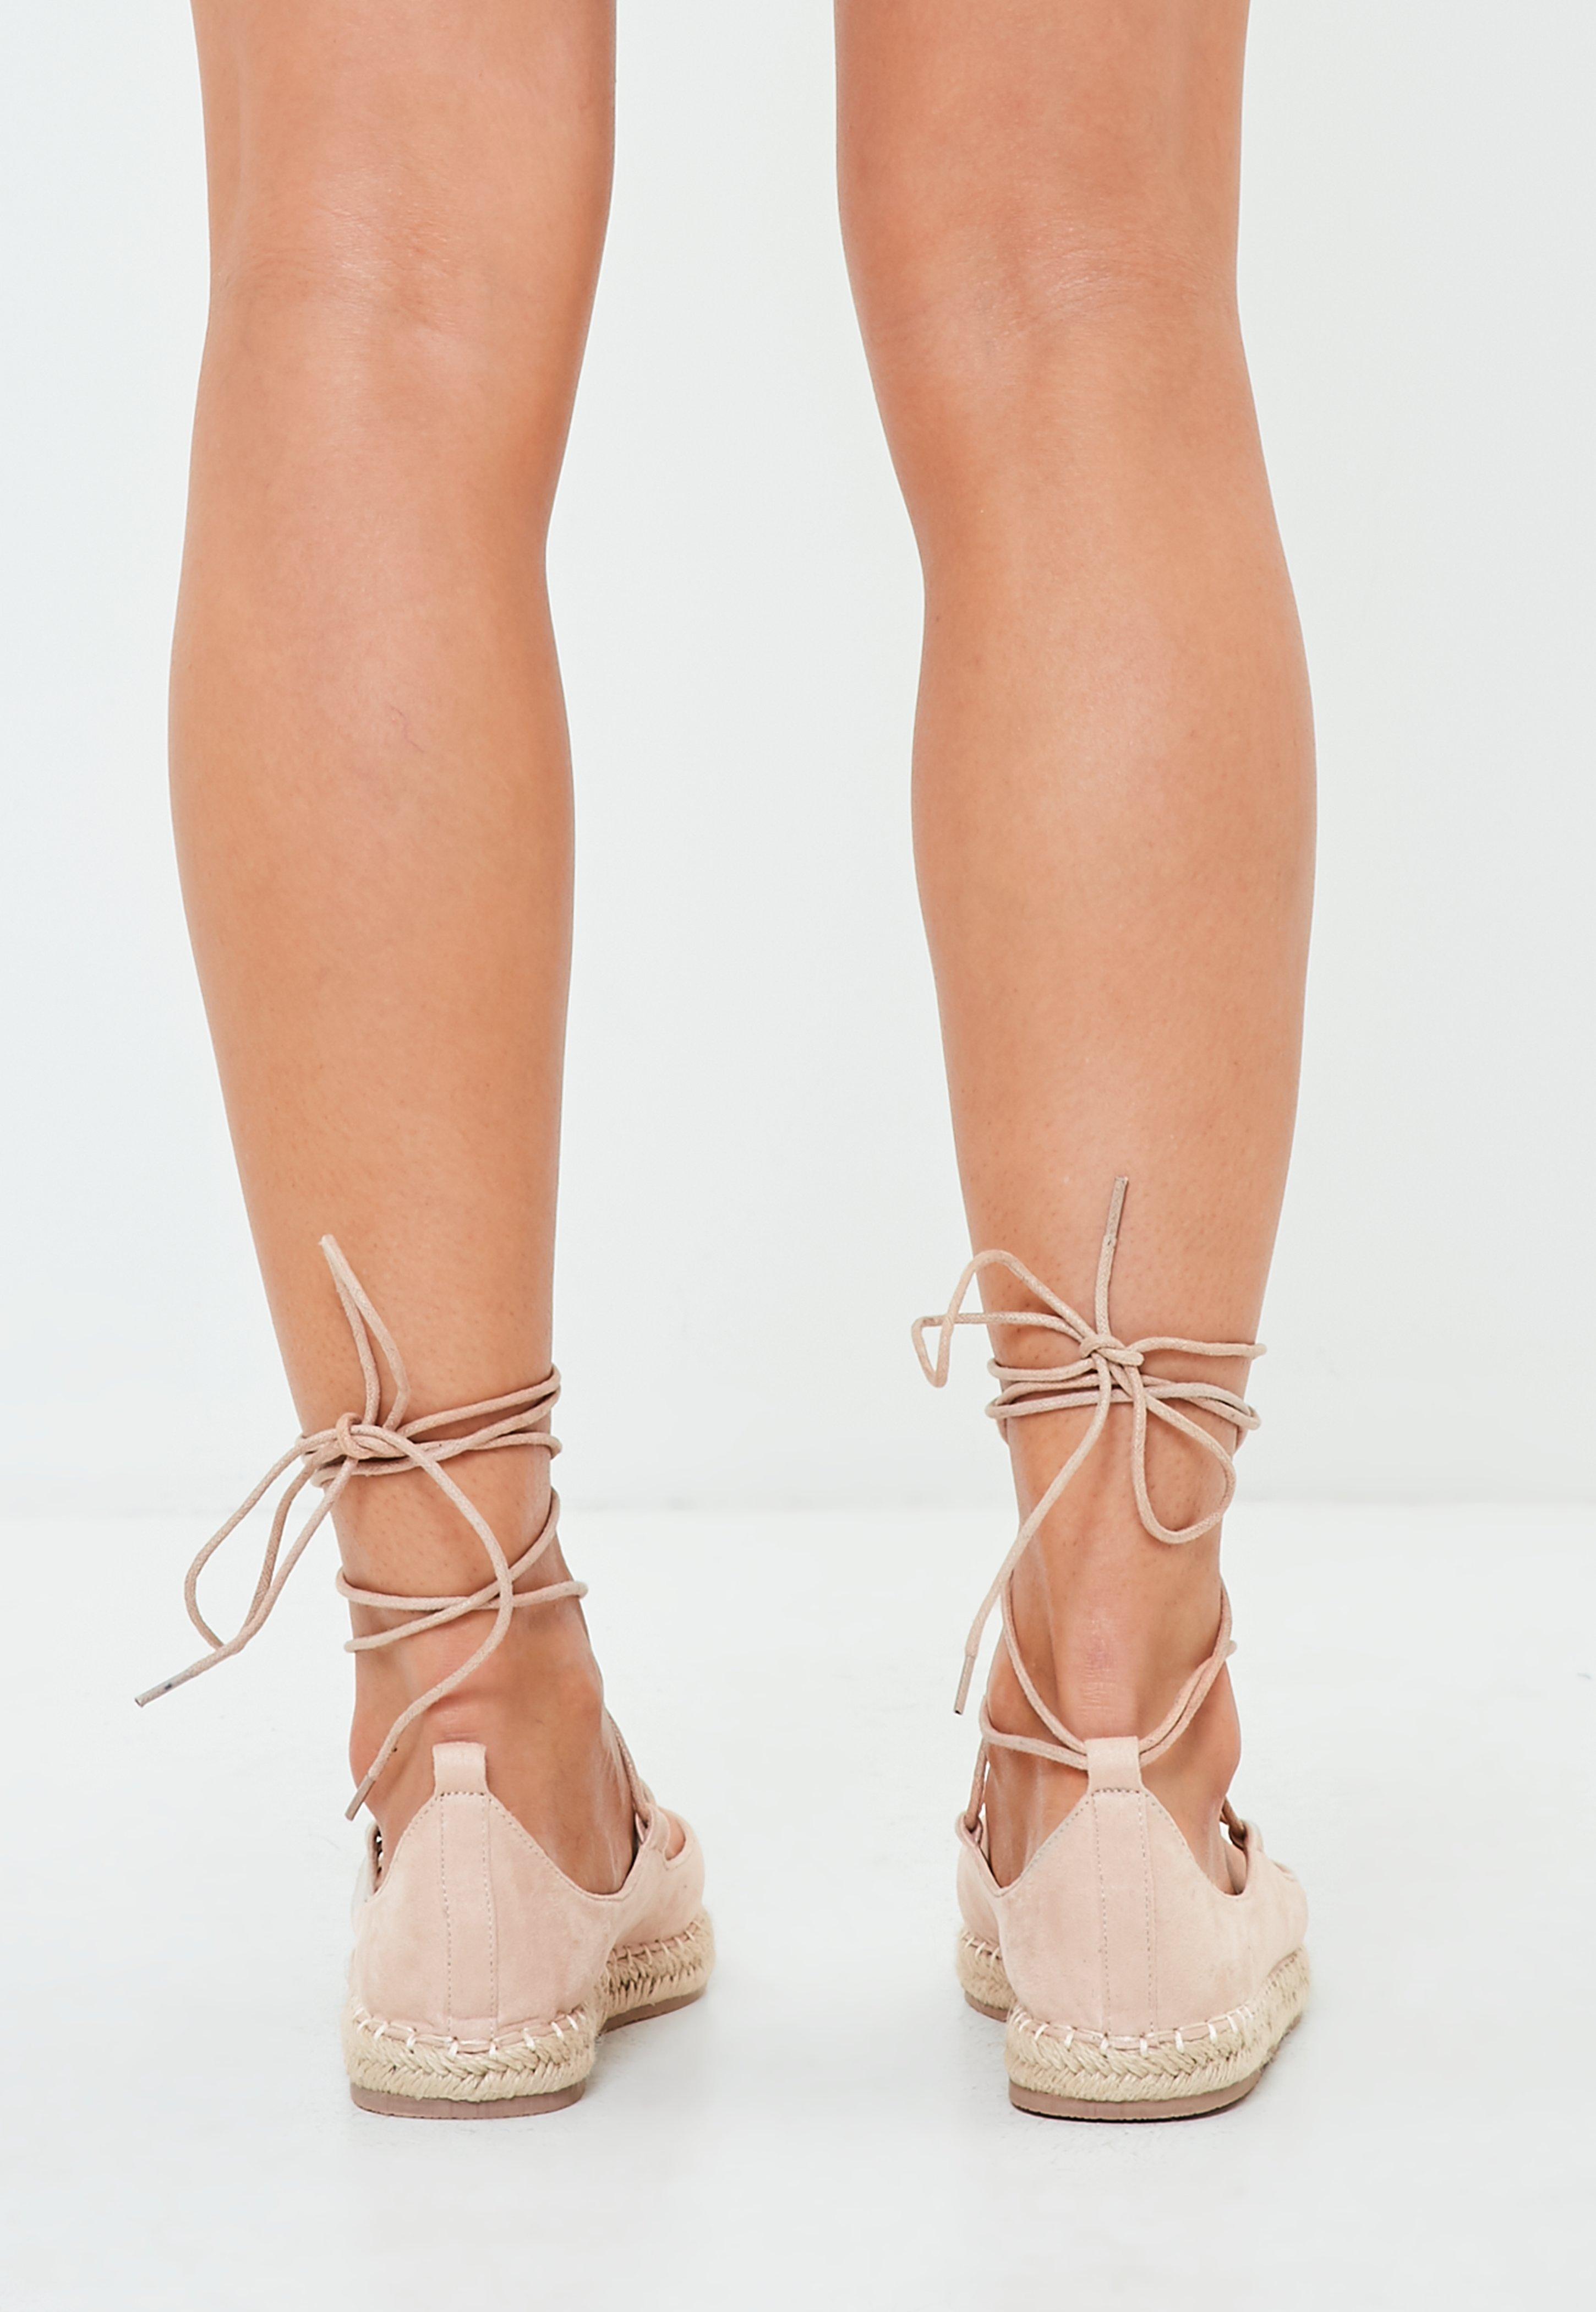 Topshop Gladiator Sandals in Natural | Lyst